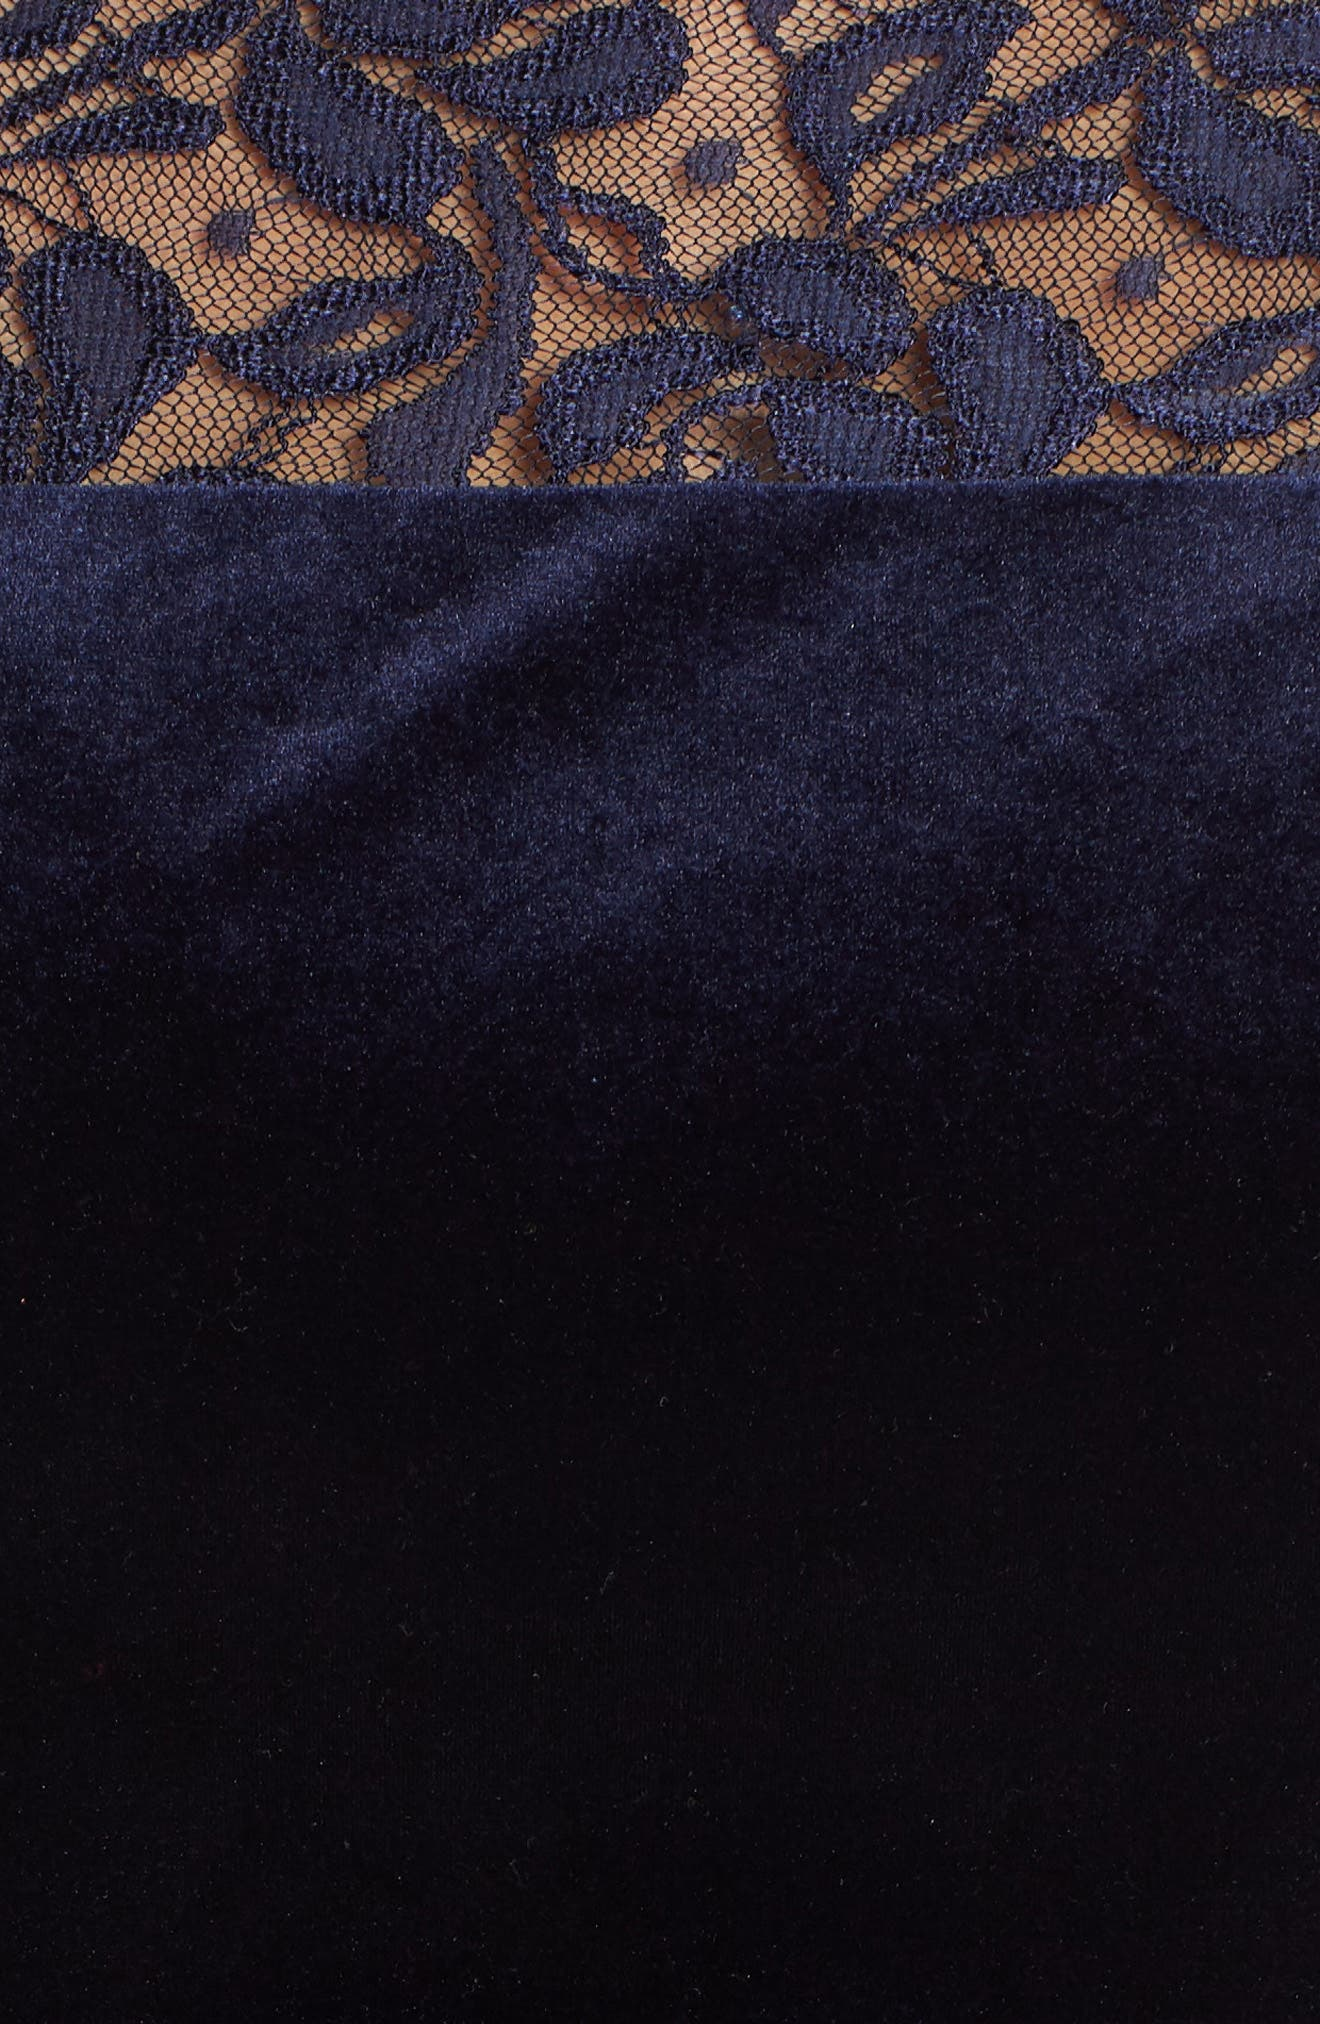 Lace & Stretch Velvet Cocktail Dress,                             Alternate thumbnail 6, color,                             NAVY